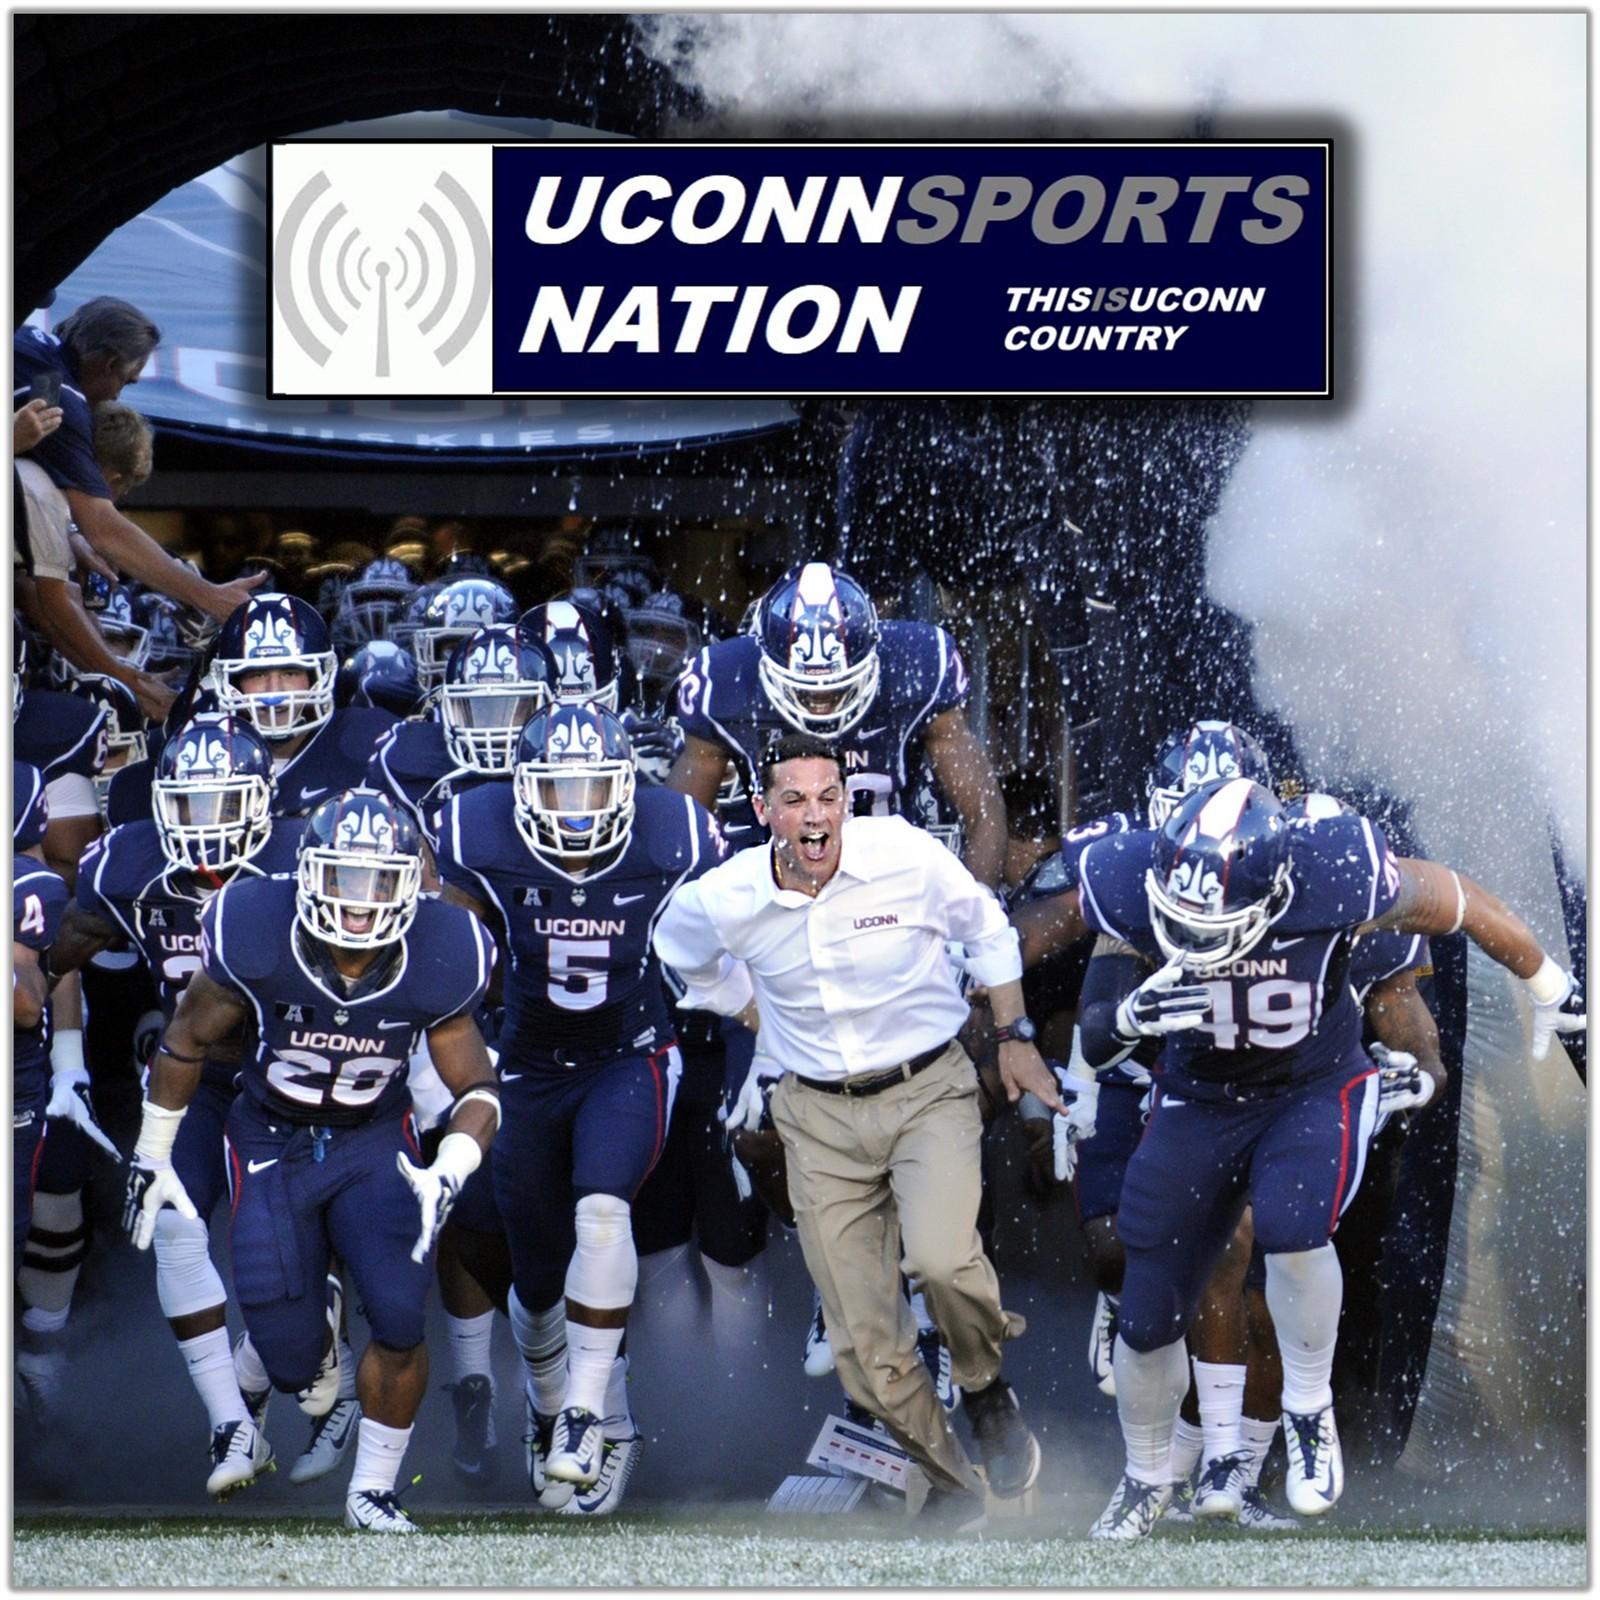 UConn Sports Nation